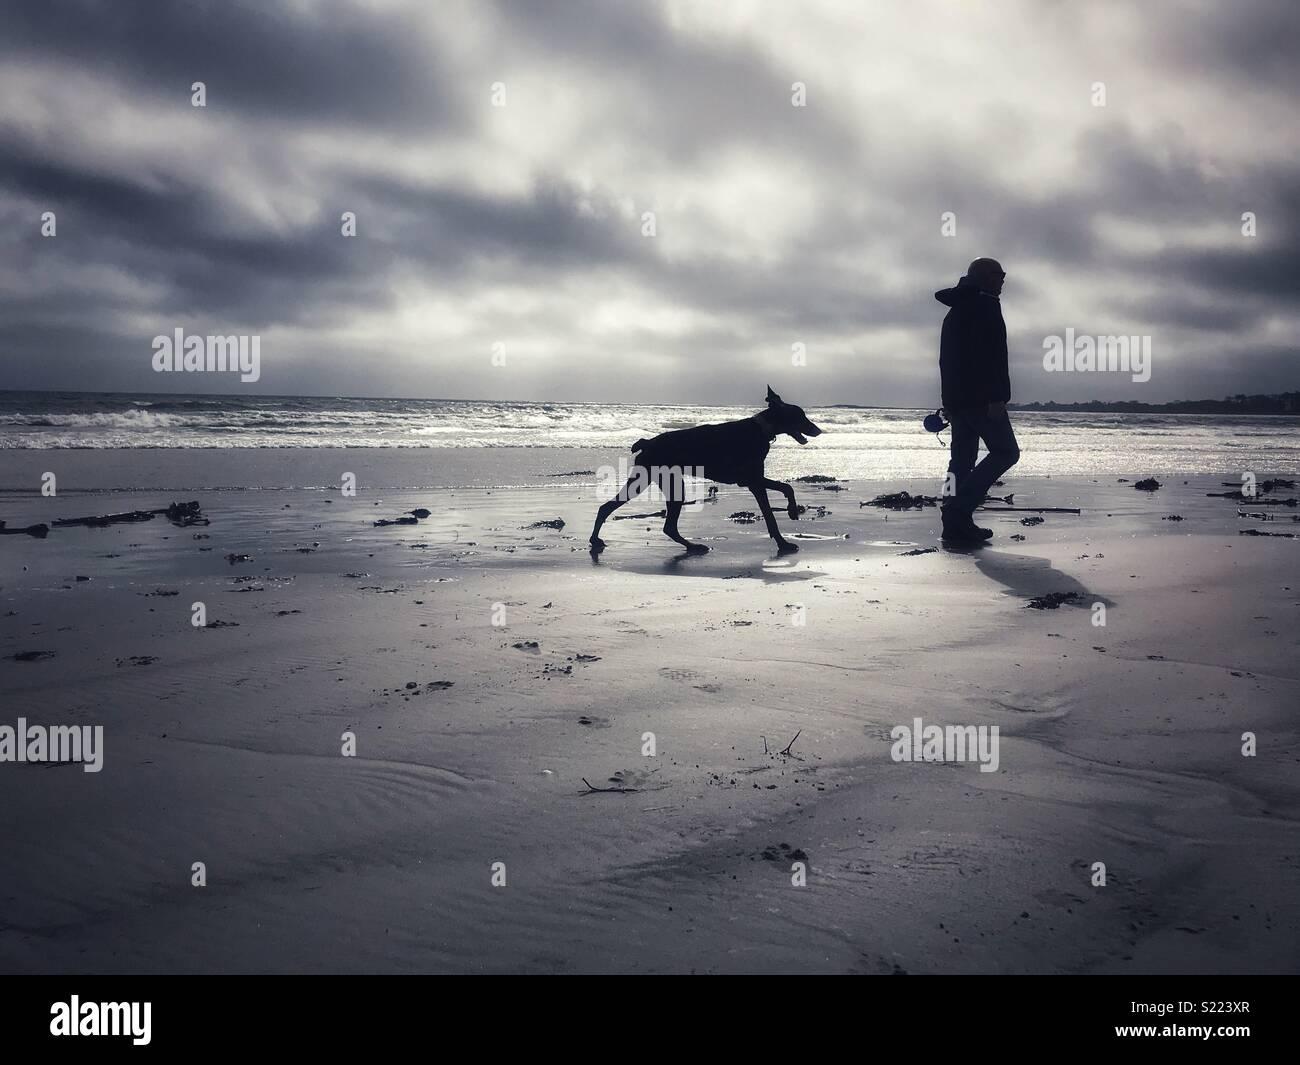 Spaziergang mit dem Hund am Strand entlang. Stockfoto